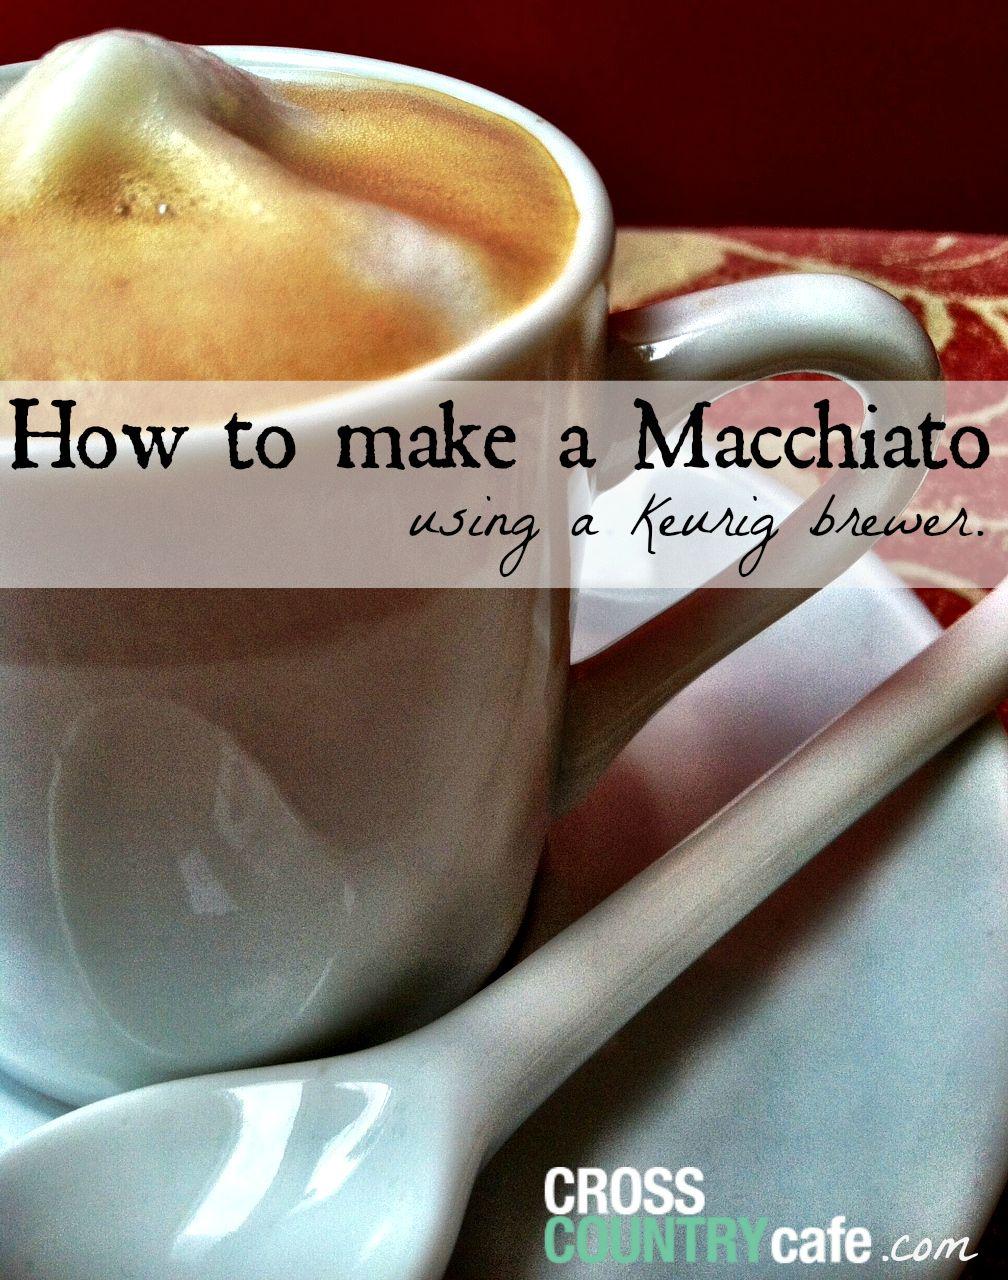 HOW TO MAKE A MACCHIATO USING A KEURIGR BREWER